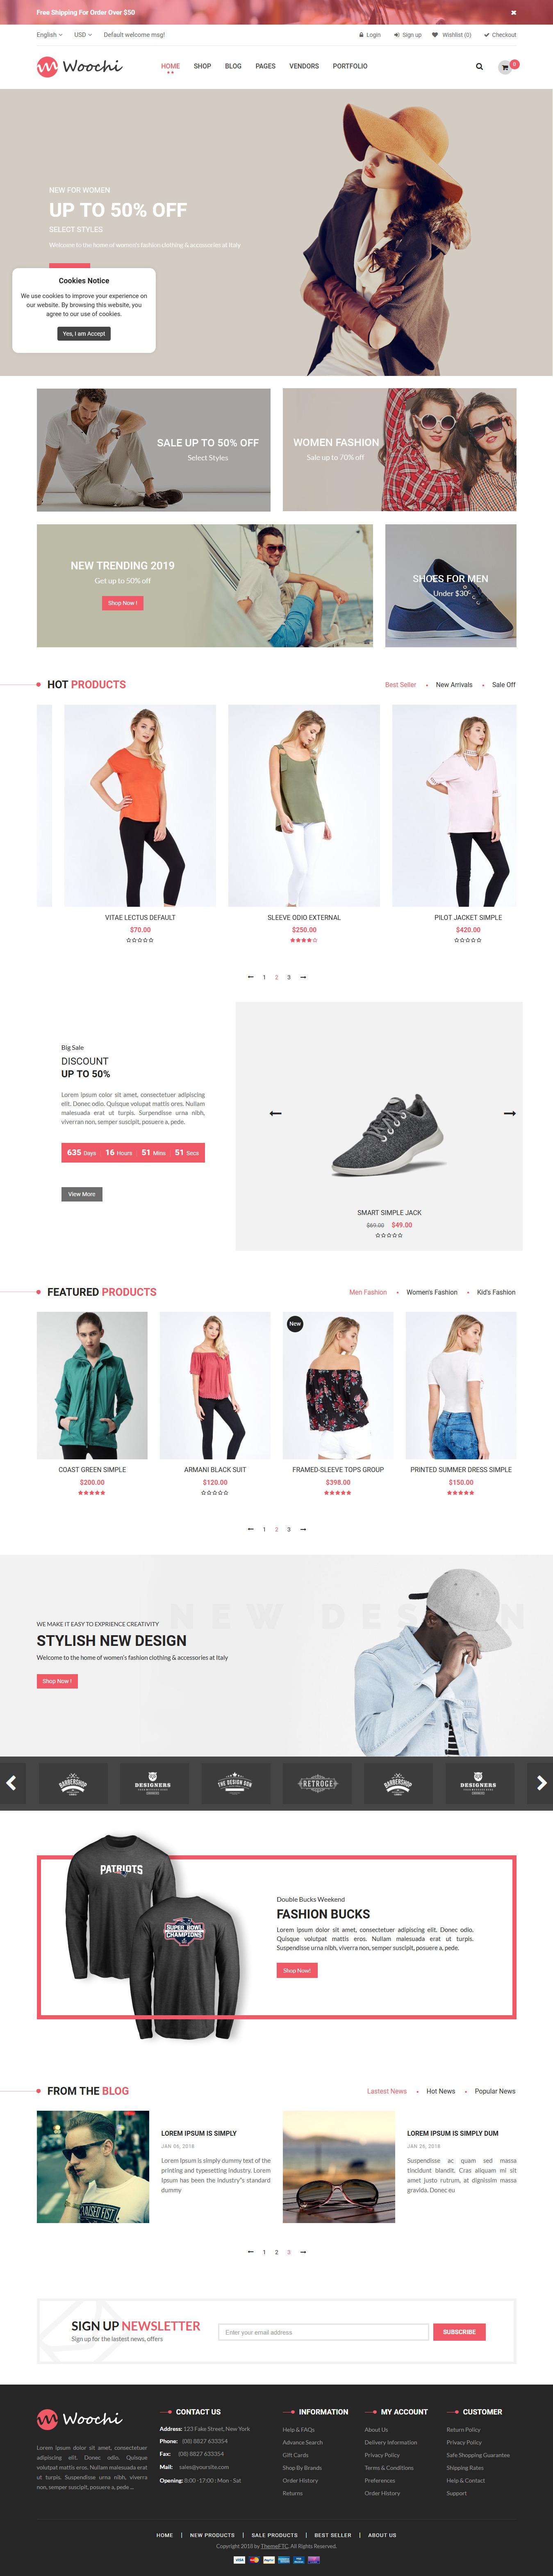 Woochi - Best Premium Fashion WordPress Themes